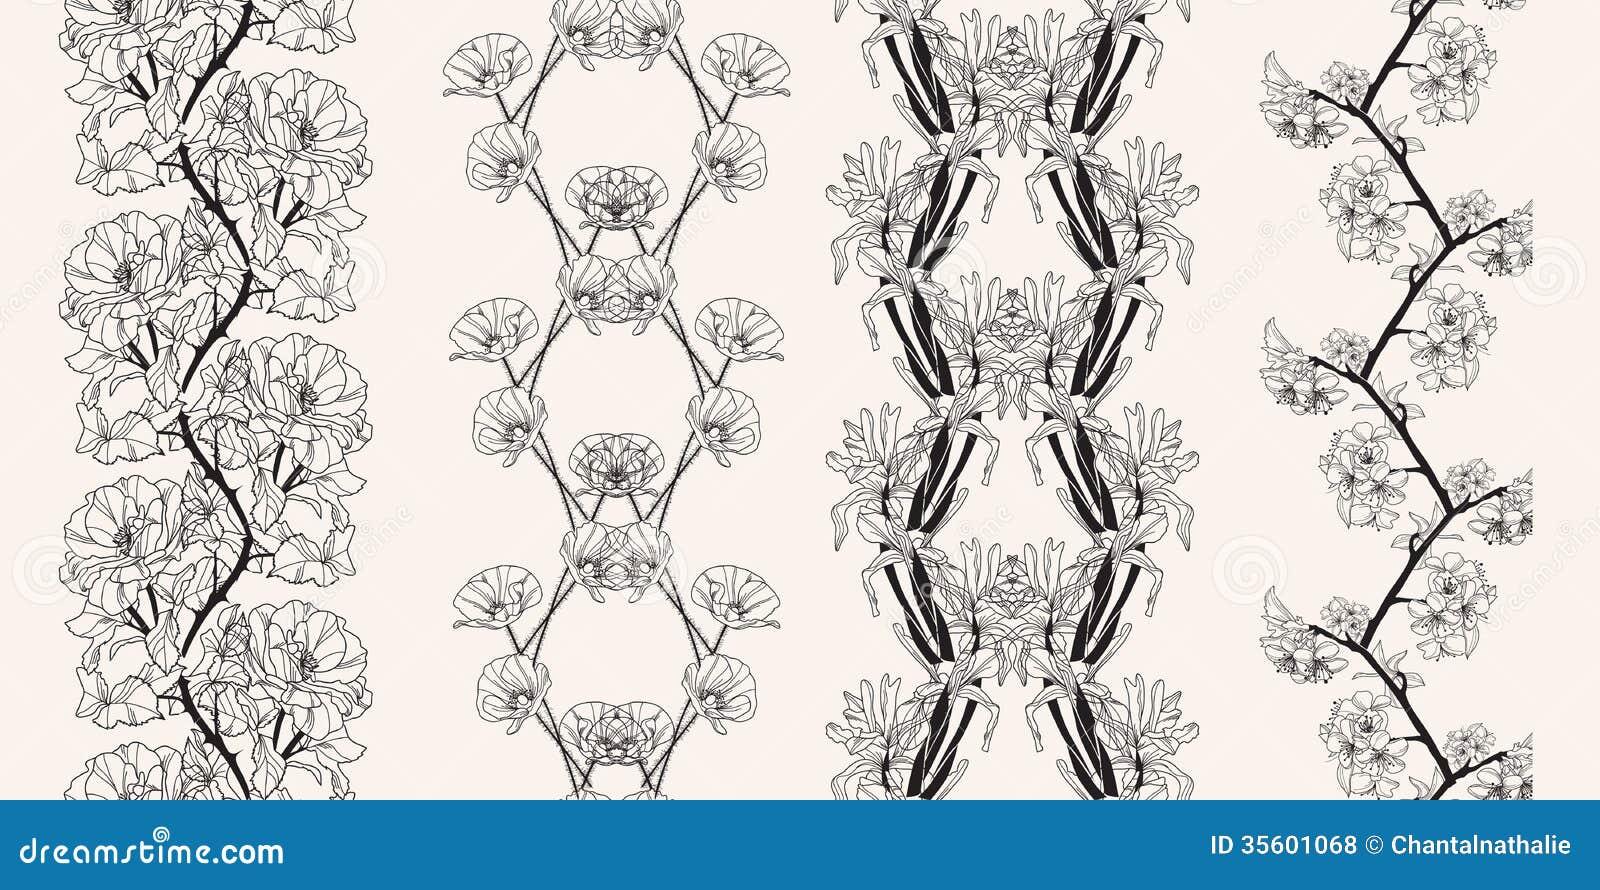 Seamless patterns royalty free stock photos image 35601068 royalty free stock photo pronofoot35fo Image collections